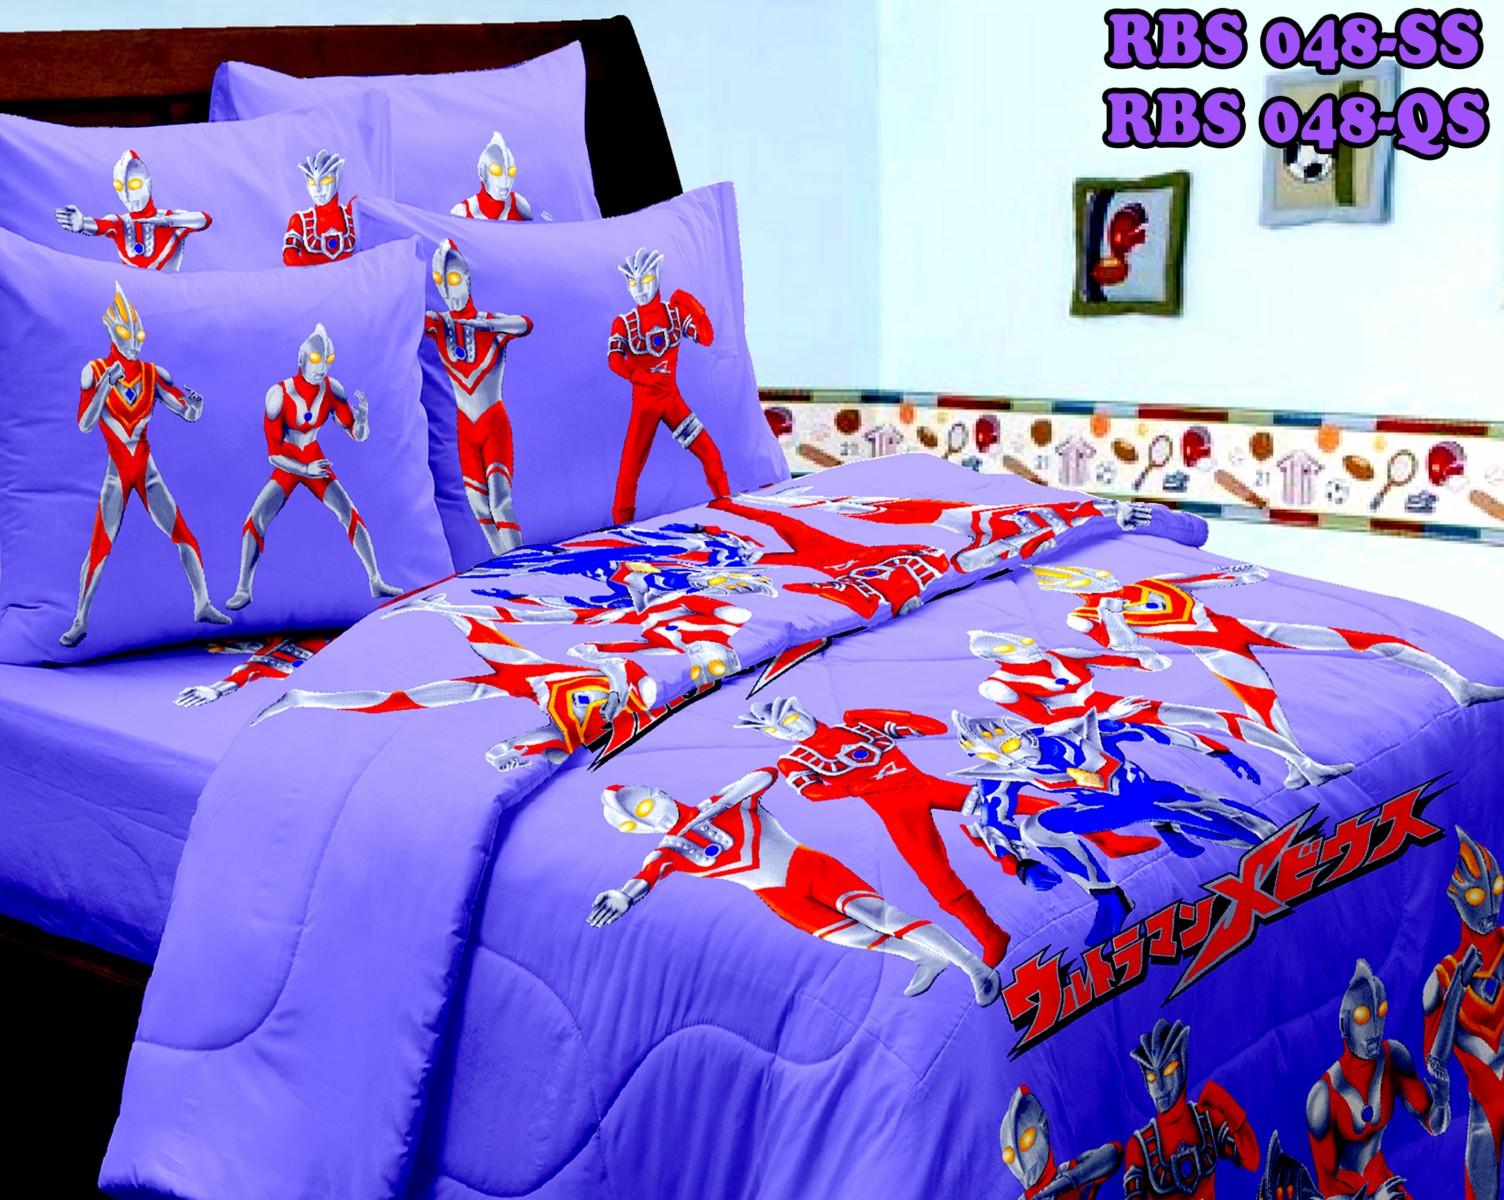 2c 2010 Set Cadar Comforter Ultraman 5 Brothers Rbs O48